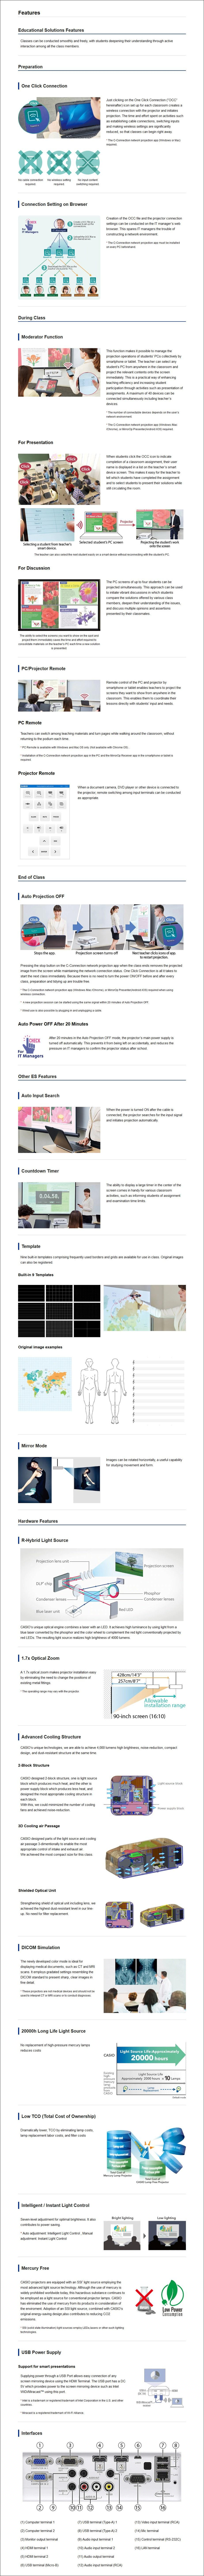 Casio XJ-S400WN Superior WXGA DLP Projector - Overview 1